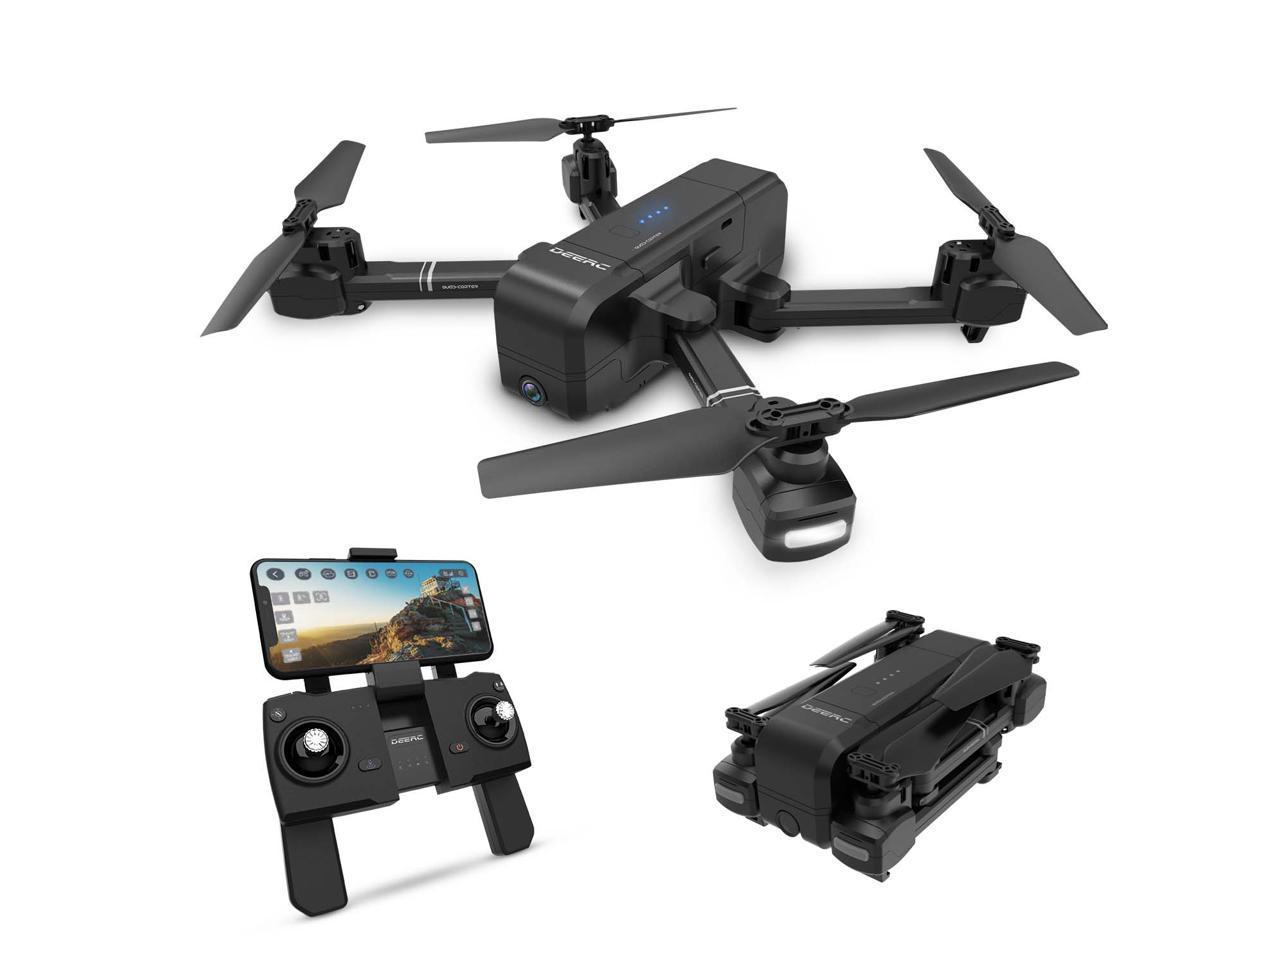 DEERC - DE25 Foldable GPS Wifi FPV Drone with 1080P Camera, Gesture Photo/Video, Custom Flight, Black $89.99